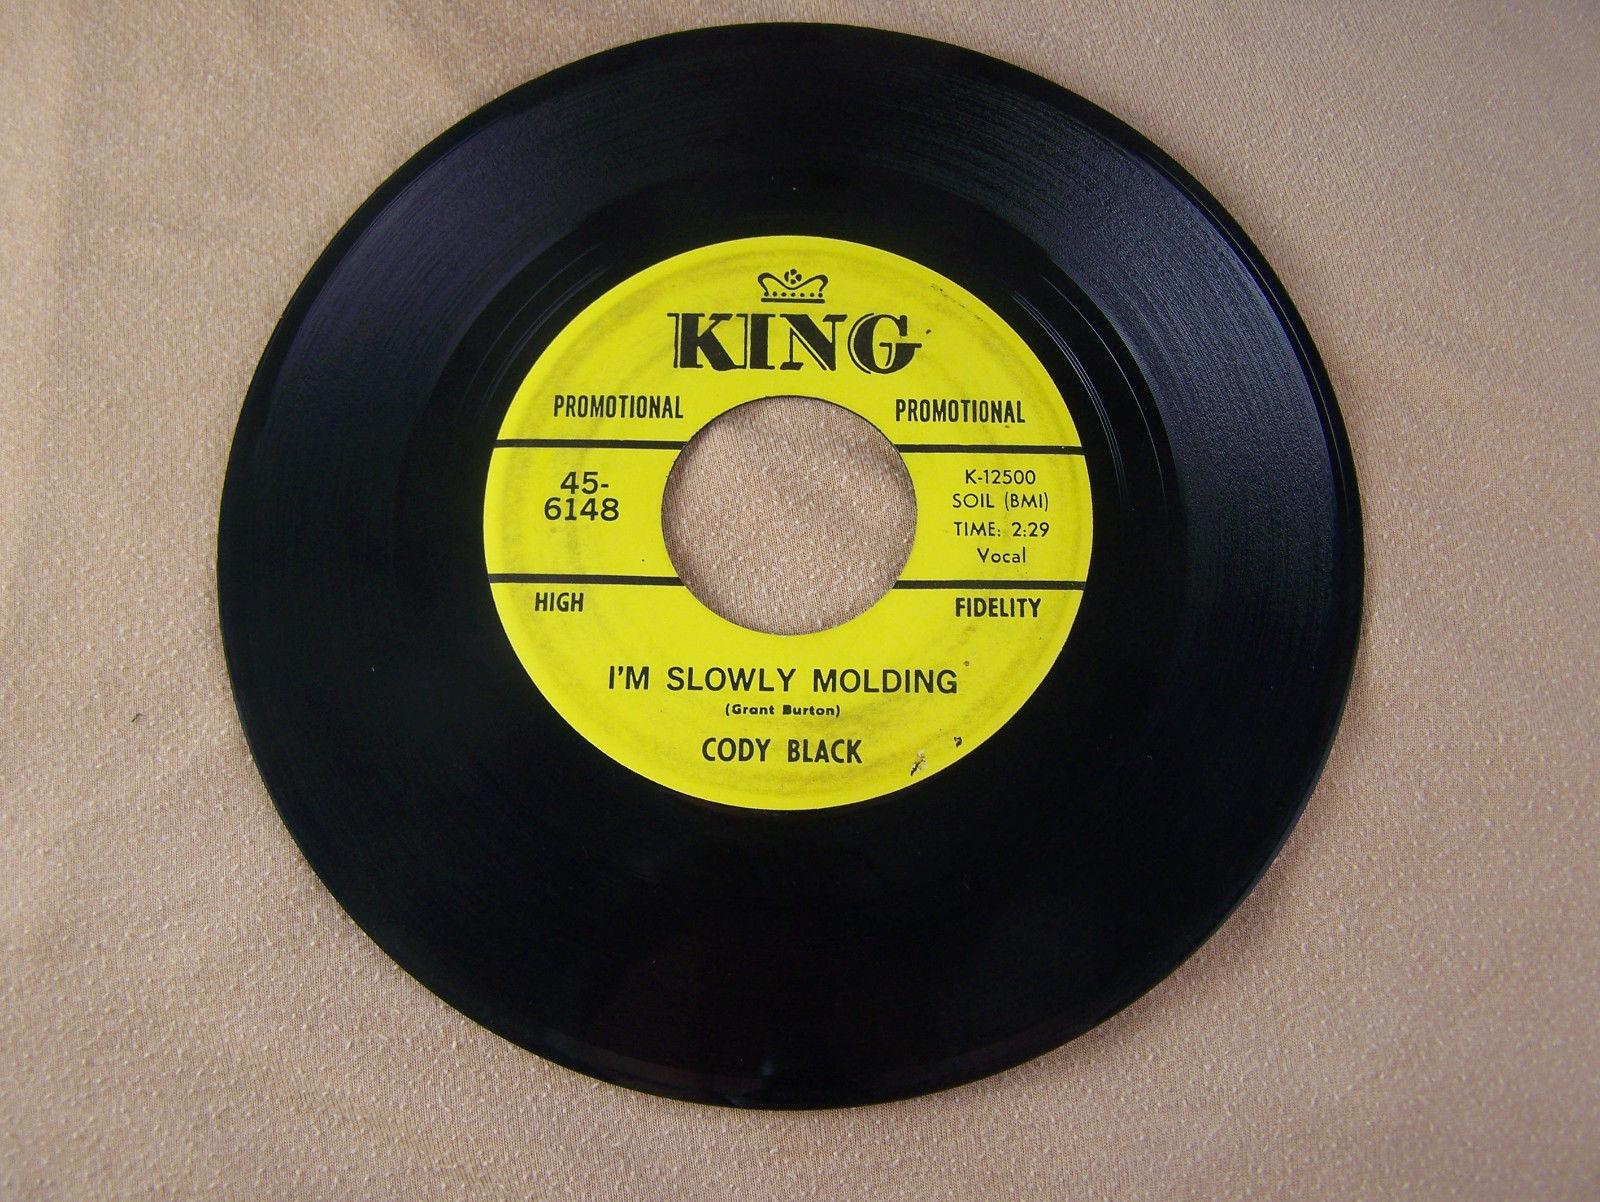 Cody Black Keep On Keeping On b/w I'm Slowly Molding King Promo 45-6148 VG Rare